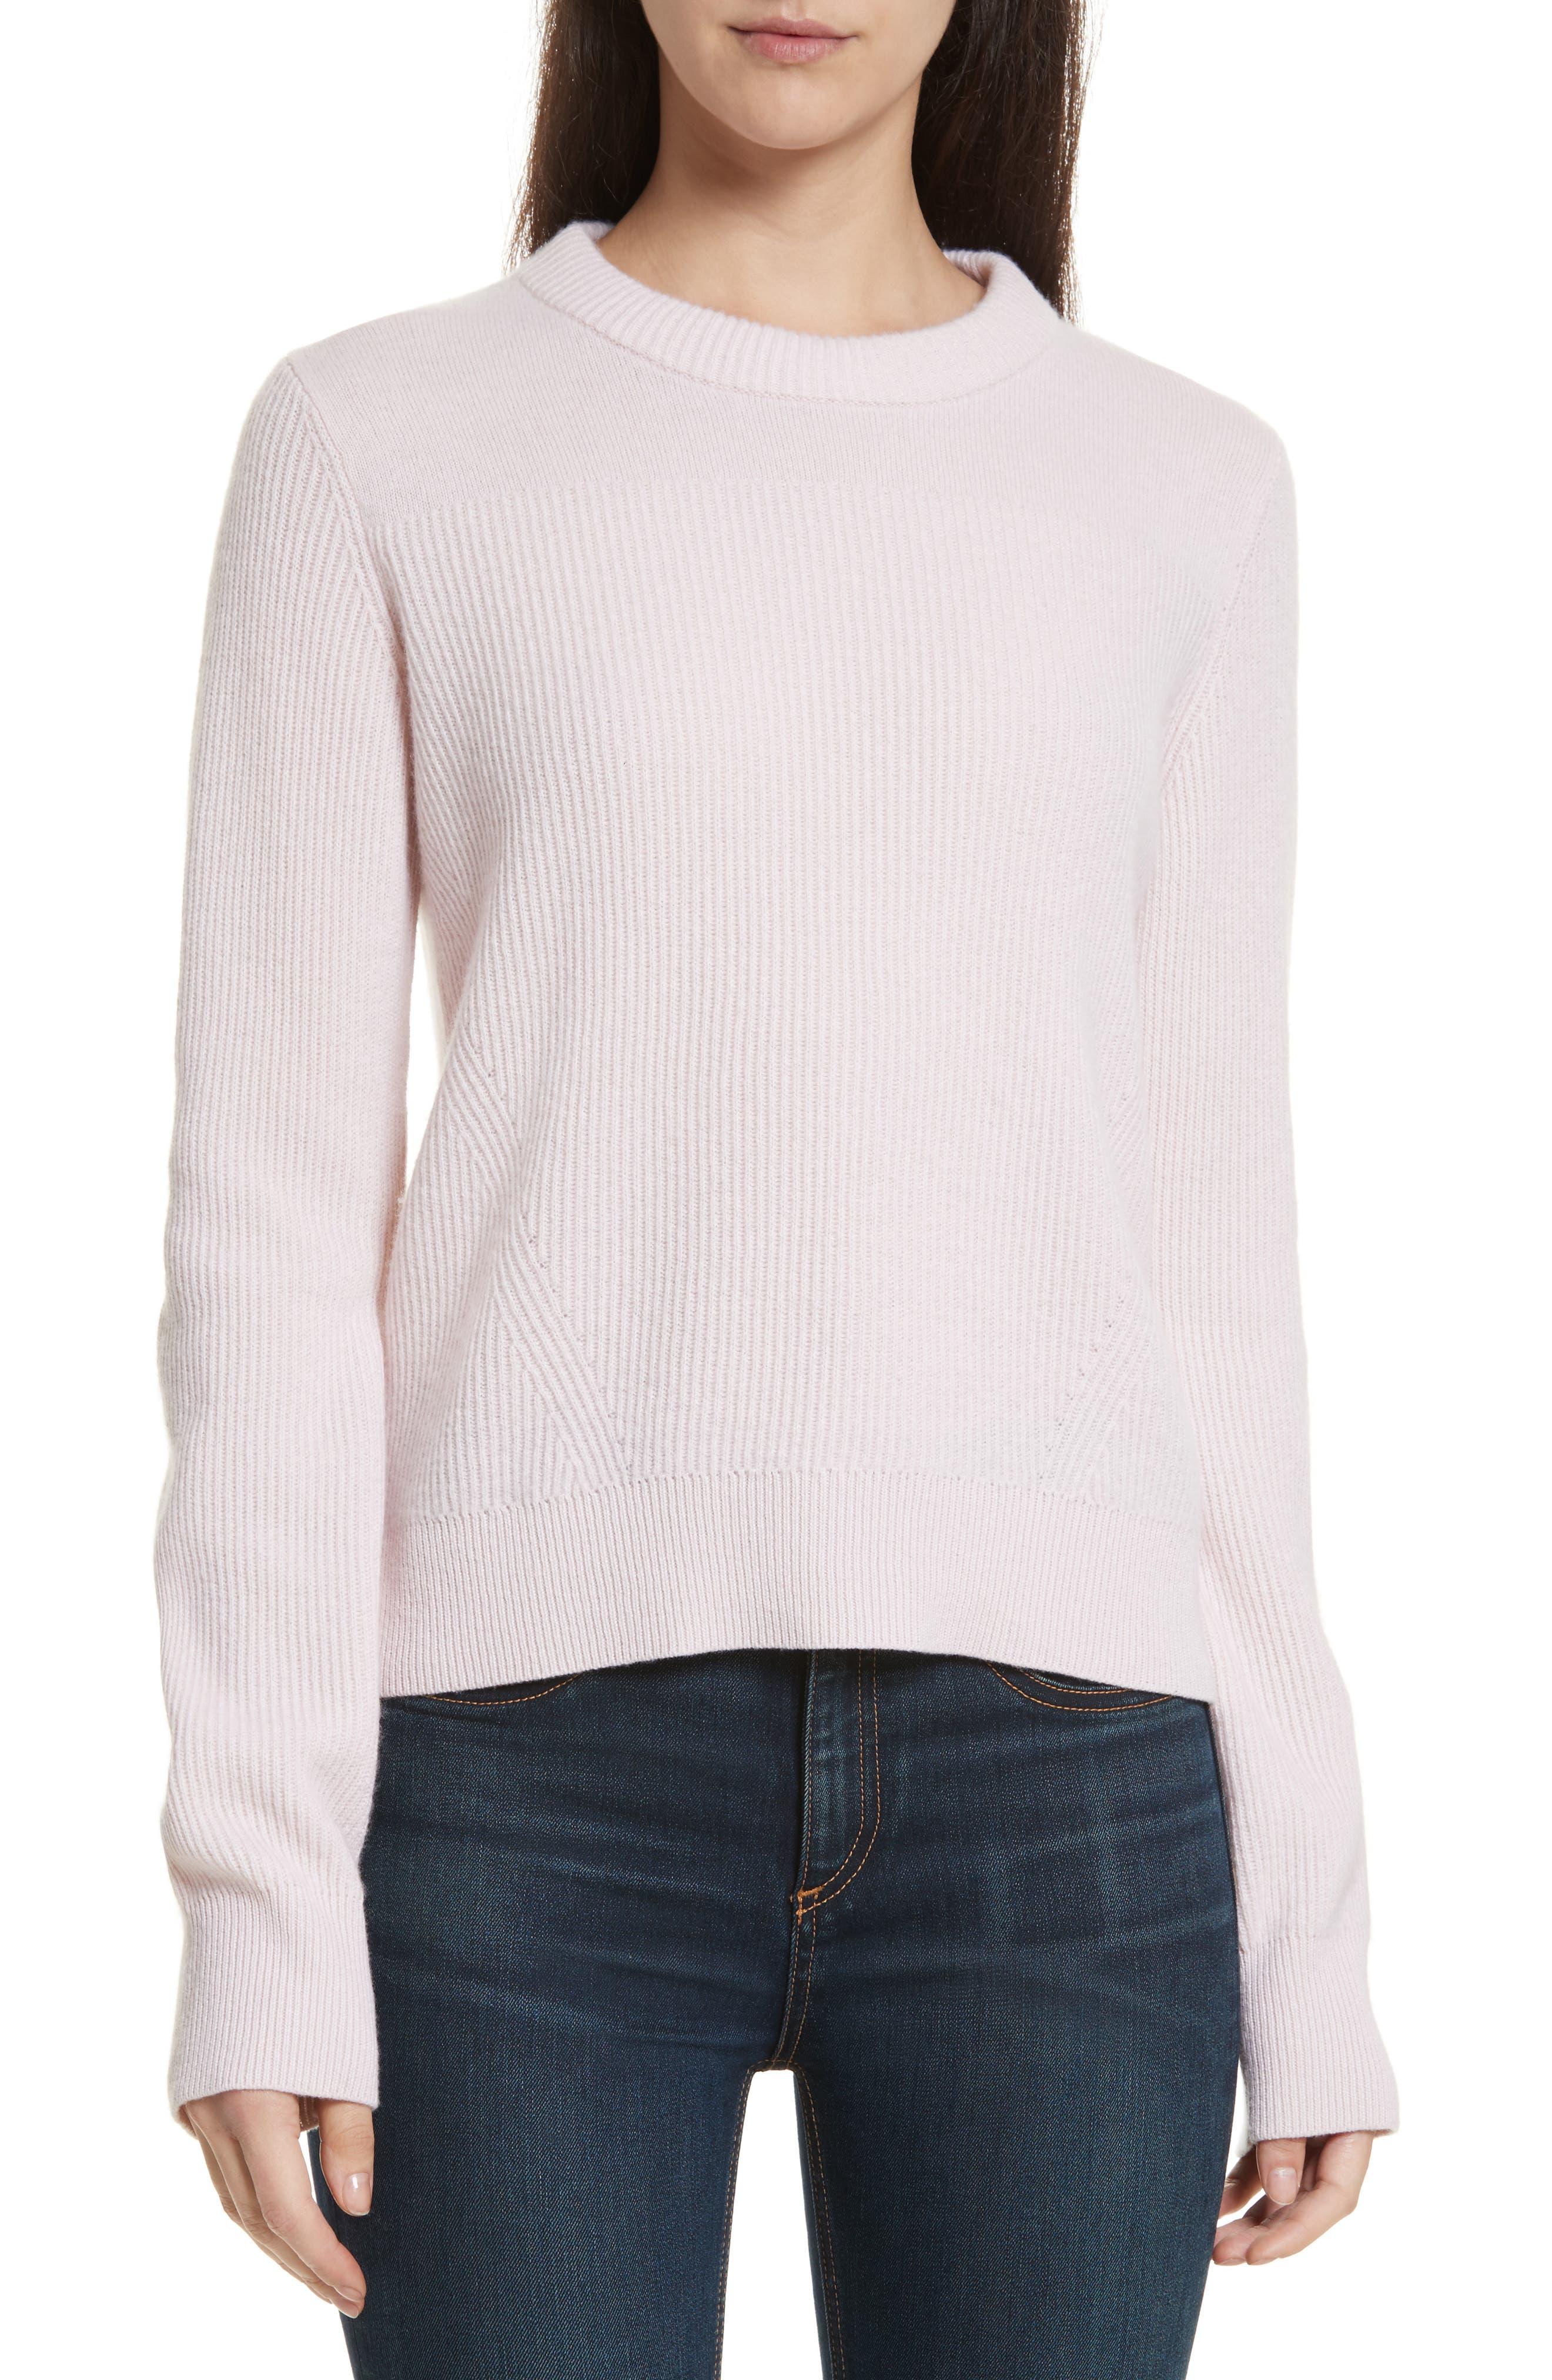 Ace Cashmere Crop Sweater,                         Main,                         color, Pink